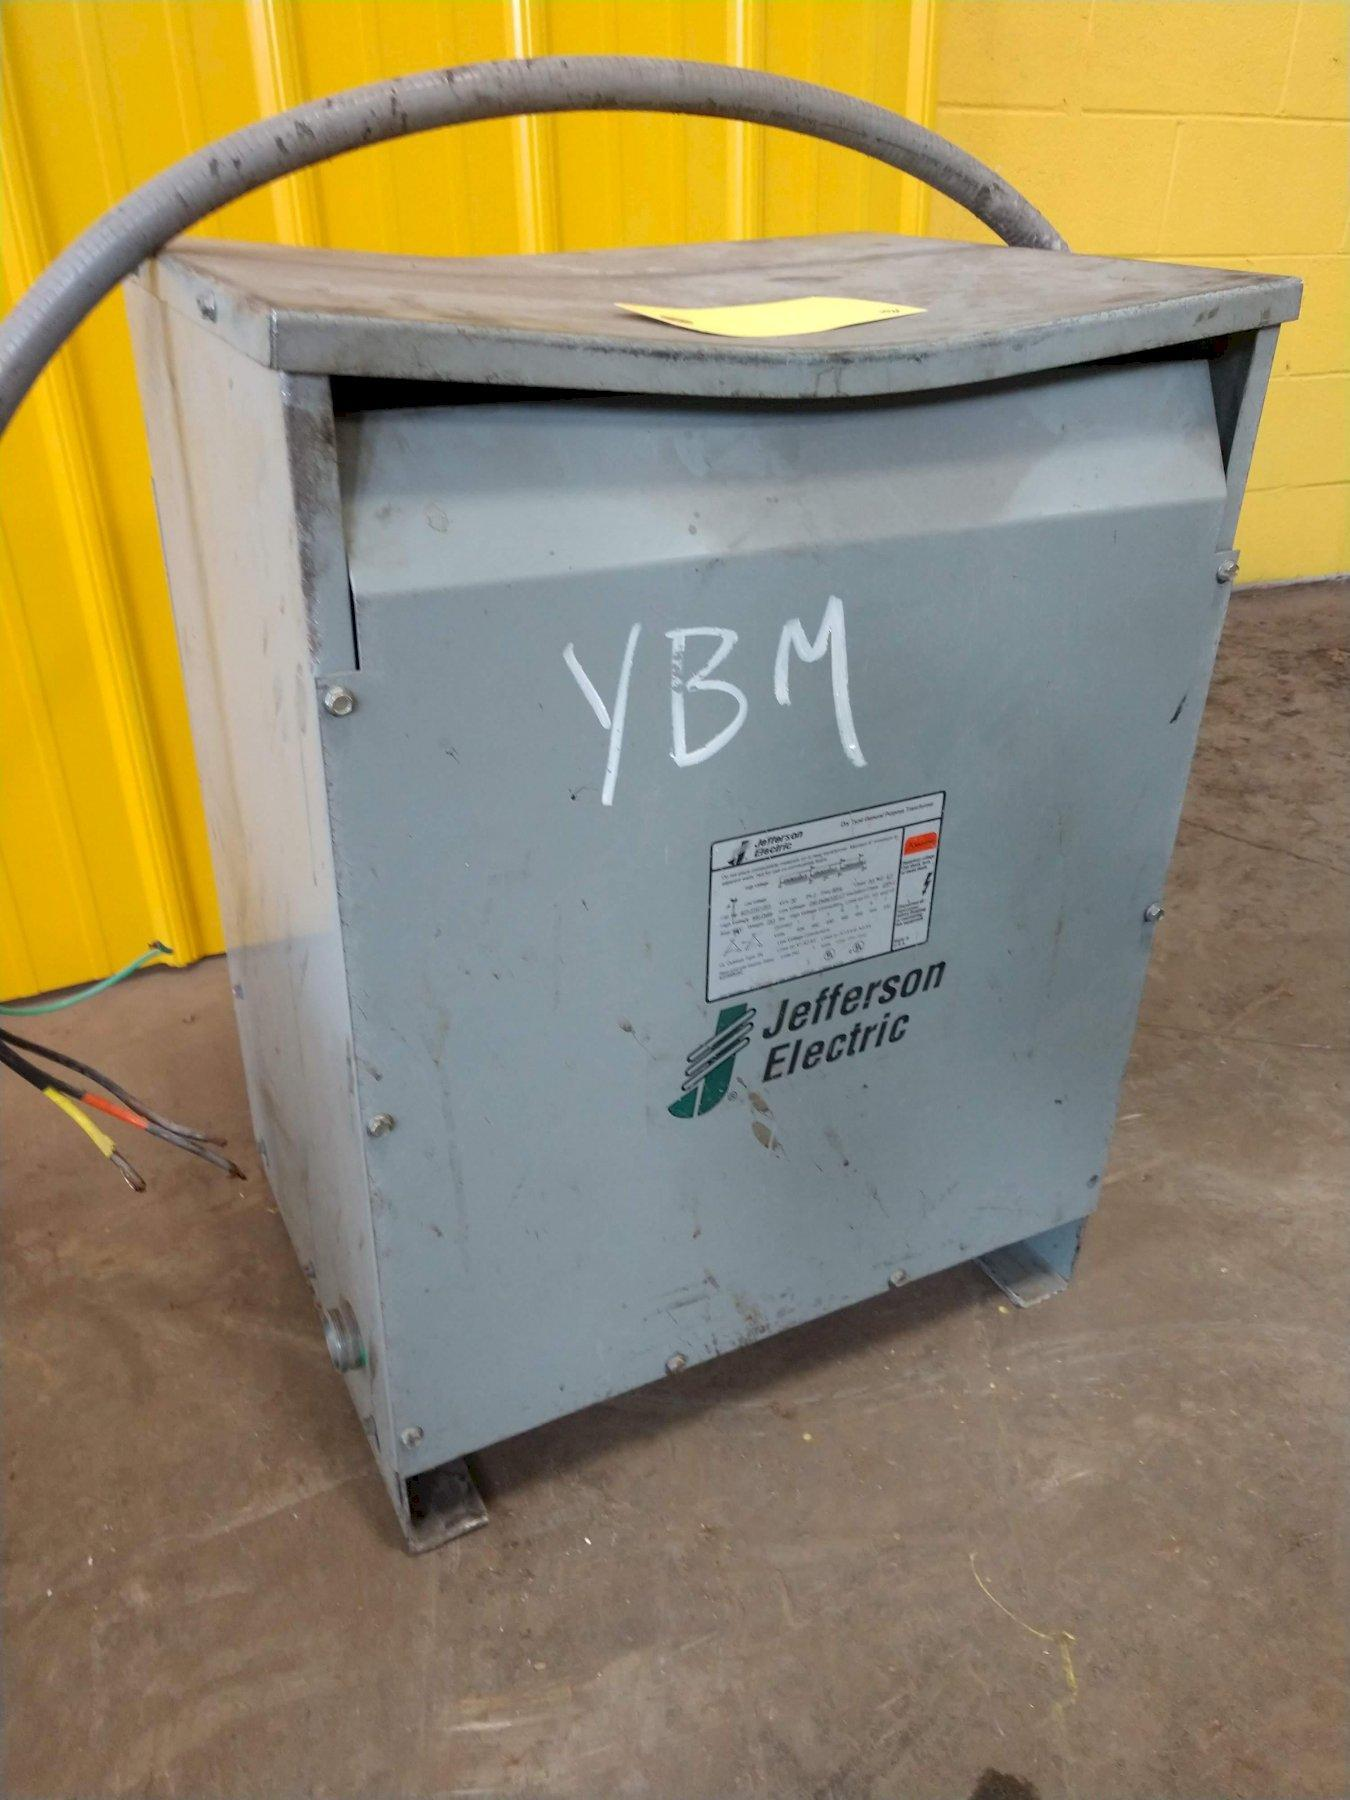 30 KVA JEFFERSON ELECTRIC 480 DELTA TO 240 DELTA/120 CT ELECTRICAL TRANSFORMER: STOCK 12902